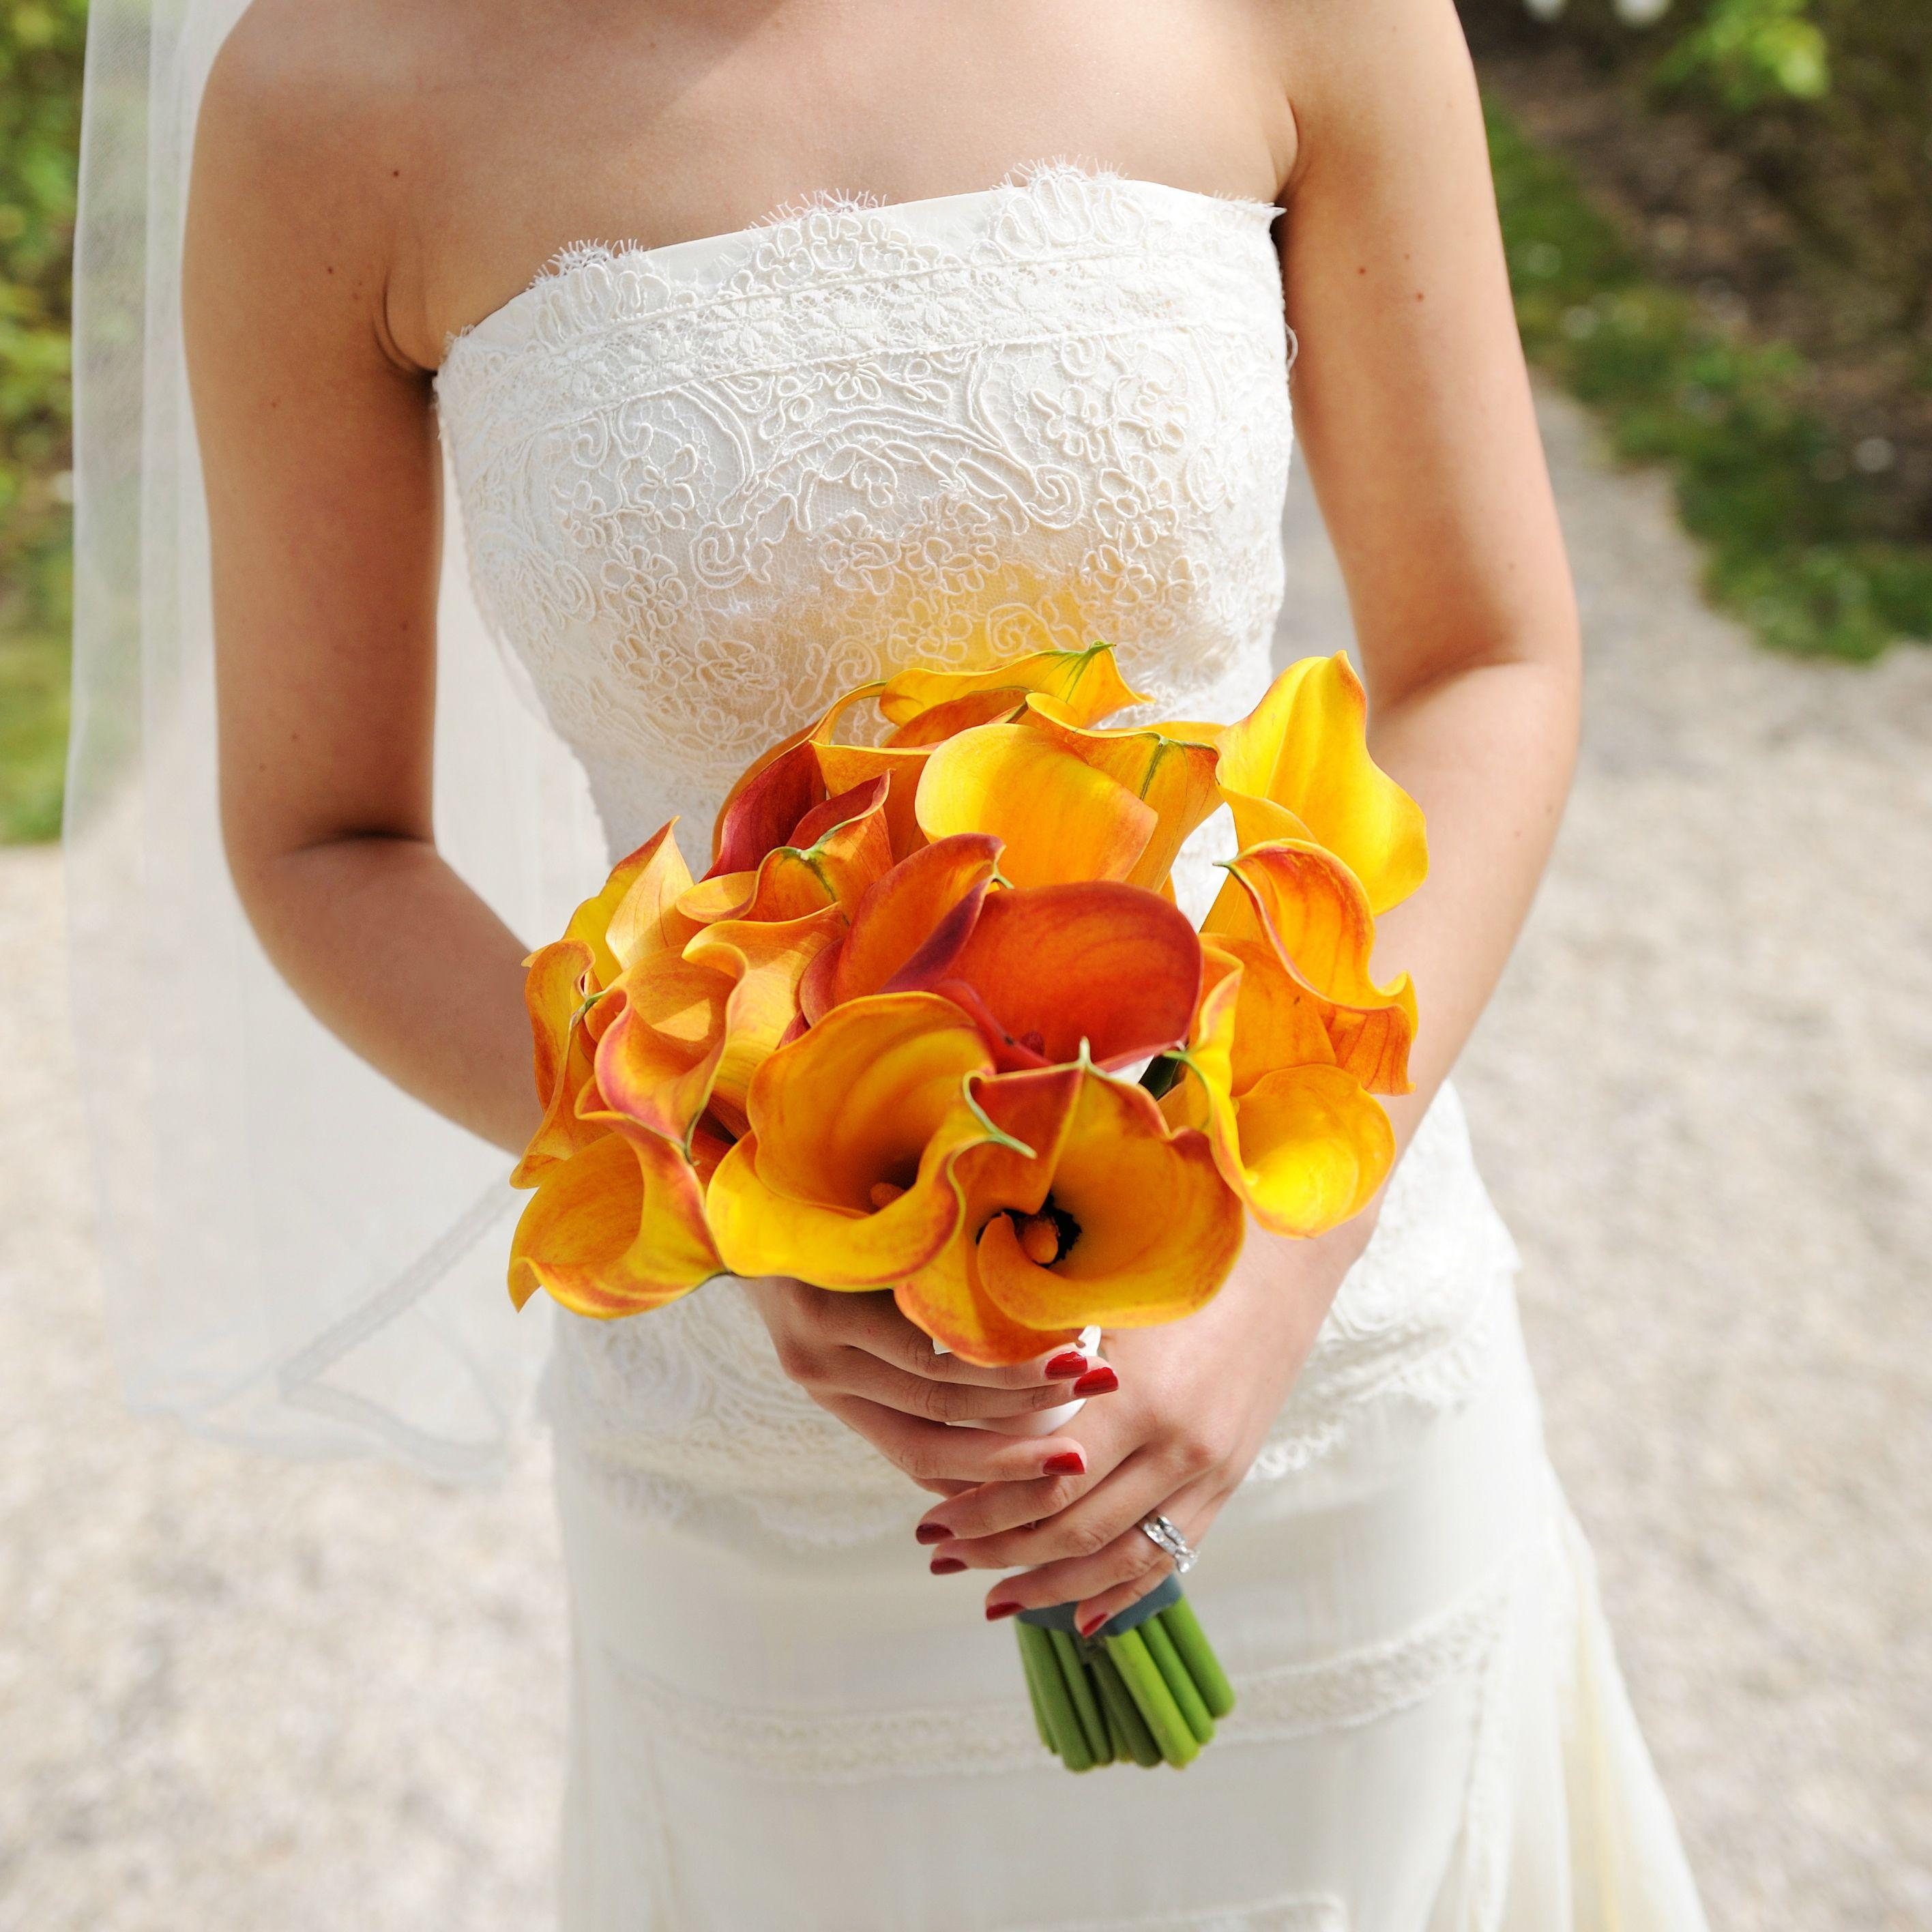 Flowers & Decor, Destinations, orange, Europe, Flowers, Wedding, Paris, france, Parisian, Parisian events, An american wedding planner in paris